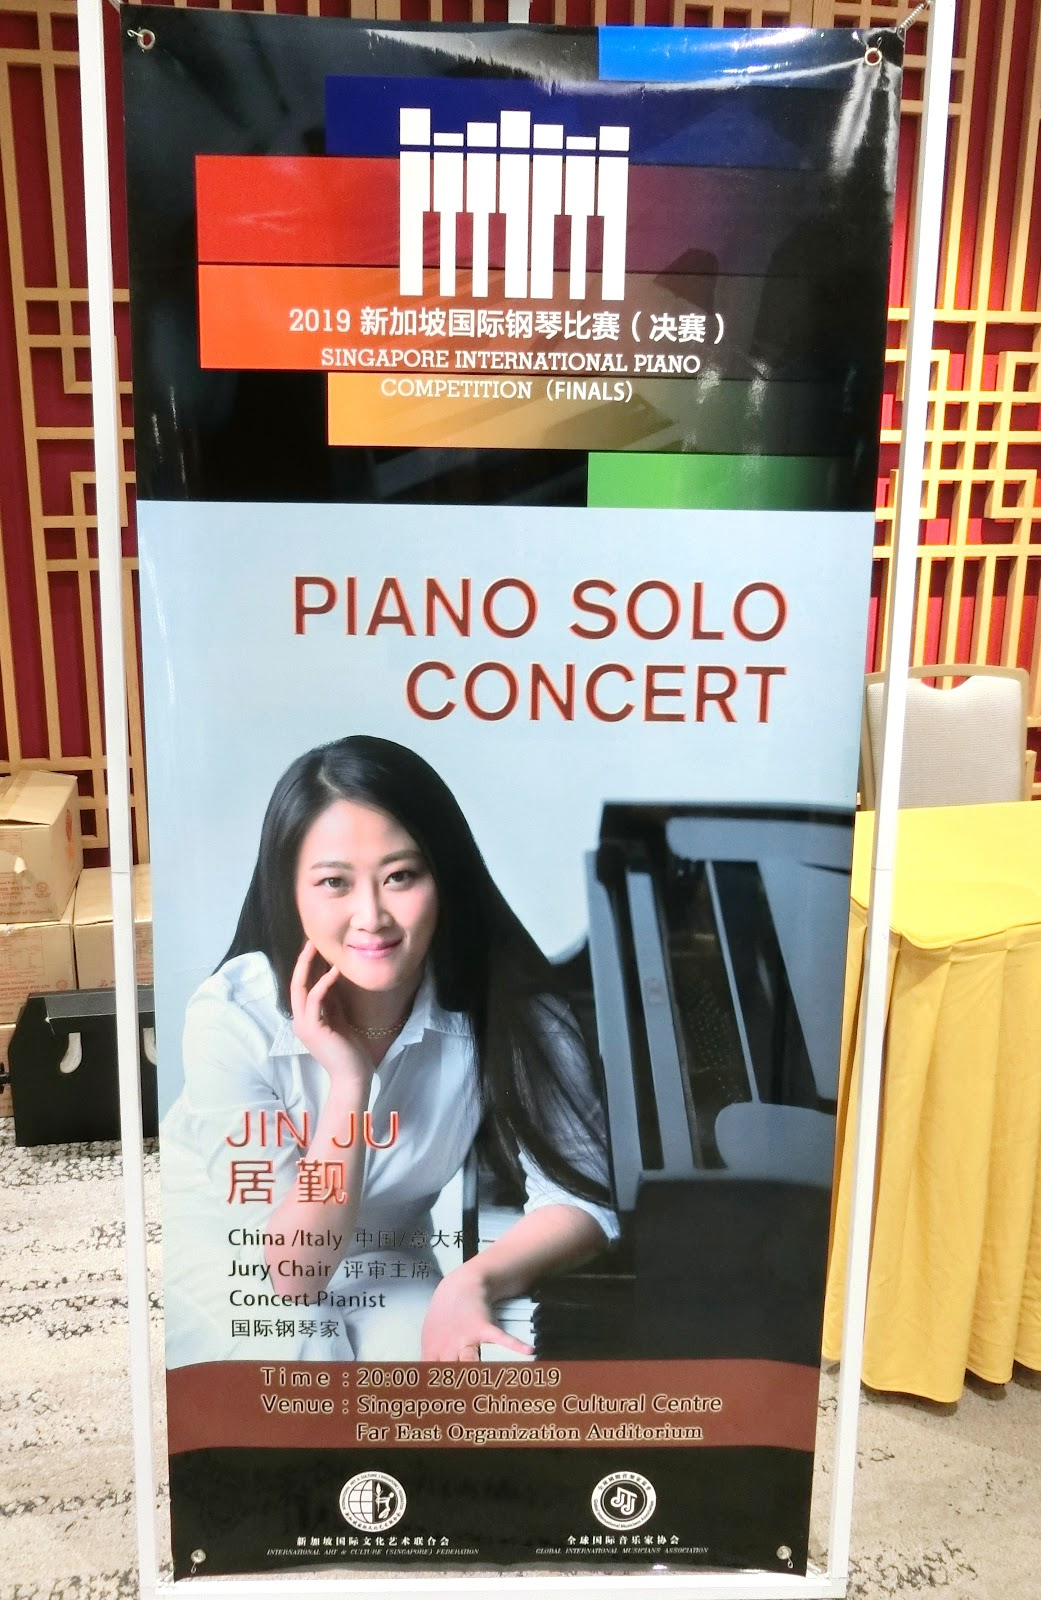 pianomania: SINGAPORE INTERNATIONAL PIANO COMPETITION 2019